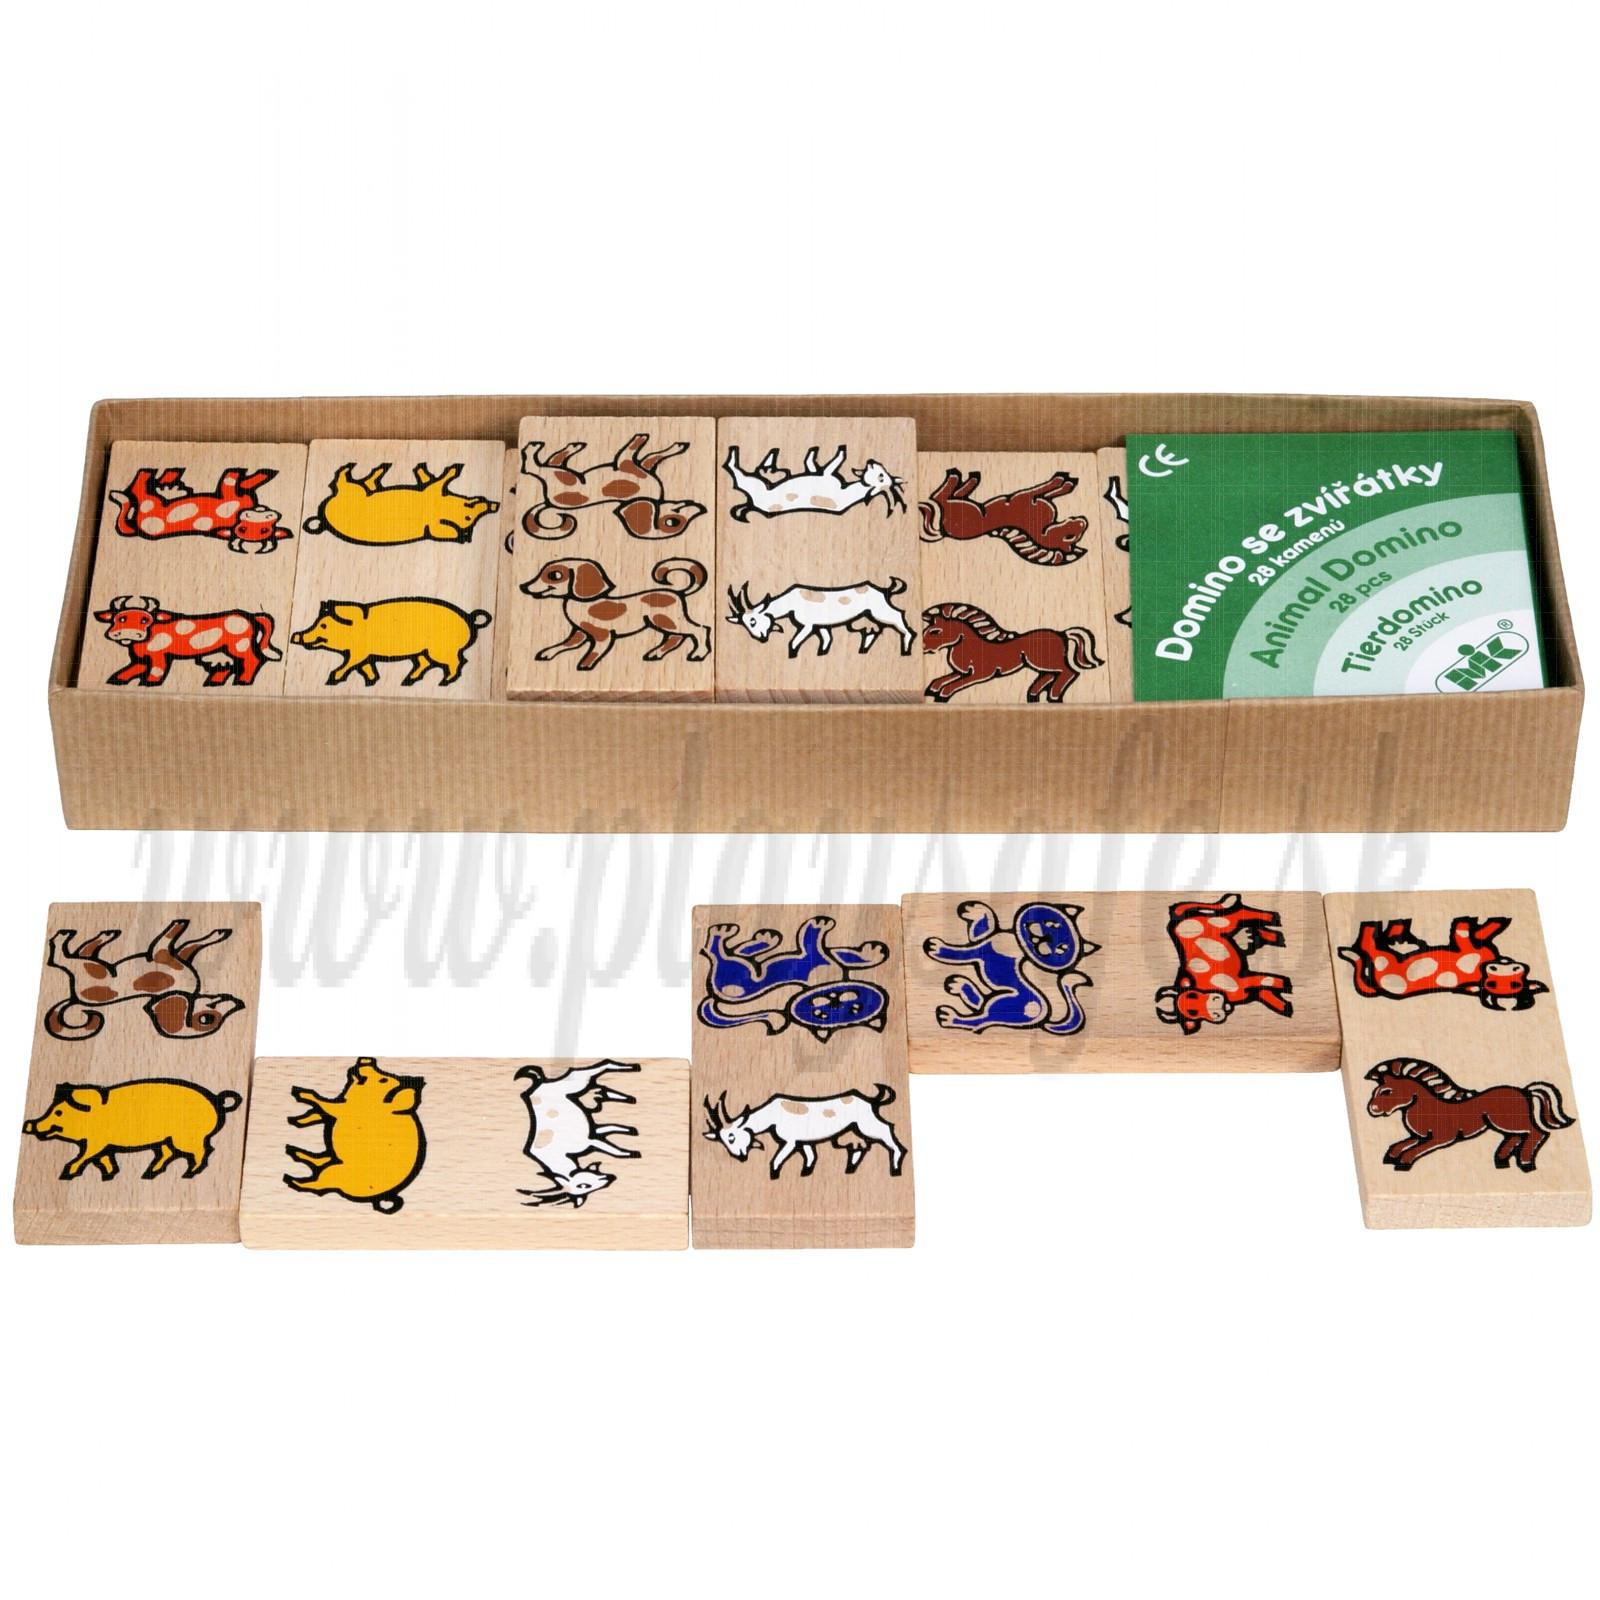 MIK Wooden Domino Farm Animals, 28 pieces